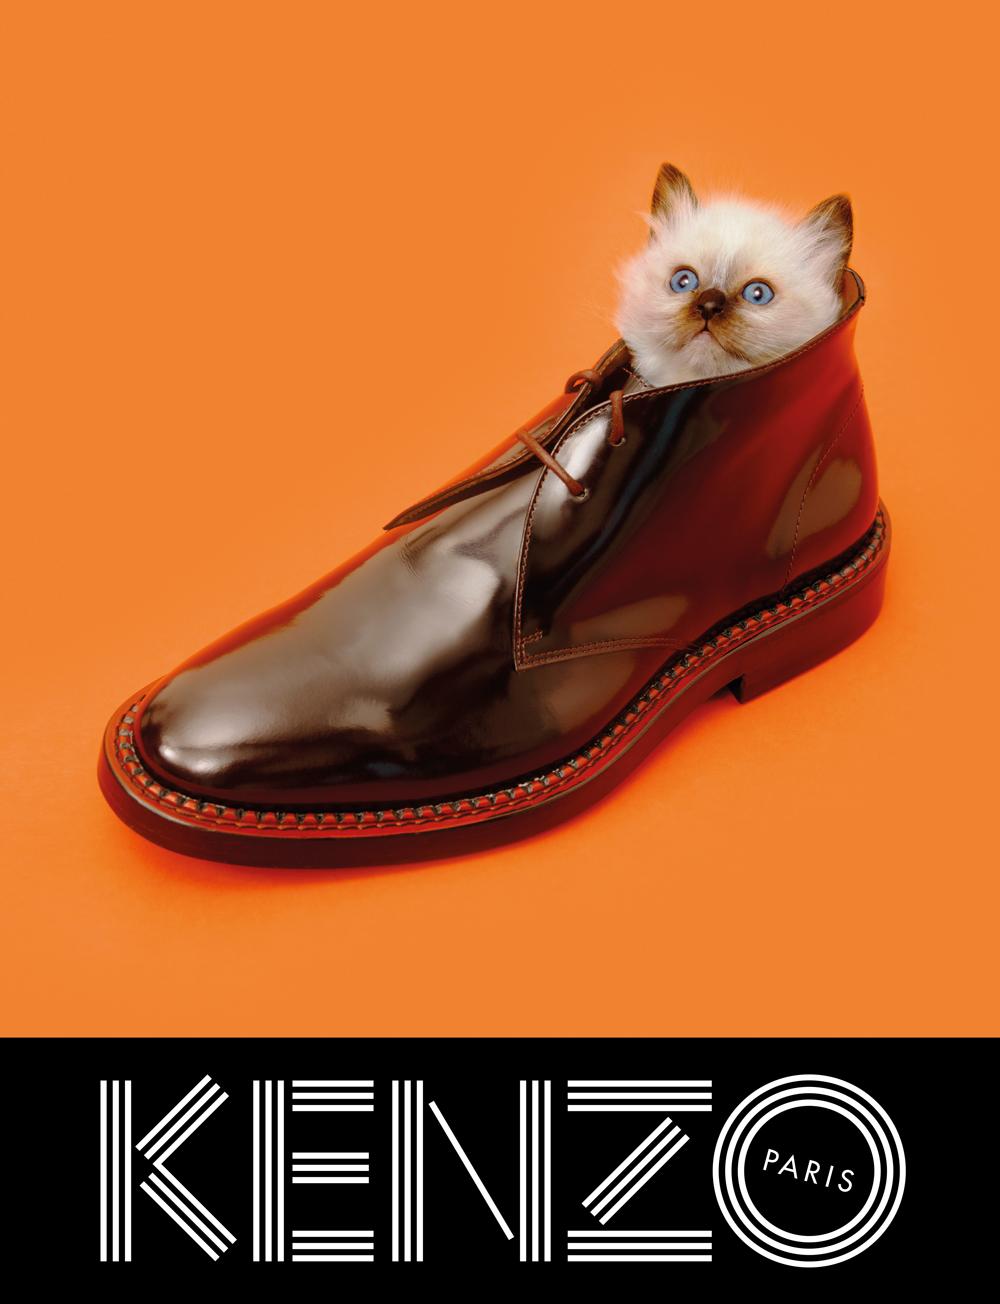 Kenzo fall/winter 2013 ad campaign by Maurizio Cattelan, Pierpaolo Ferrari